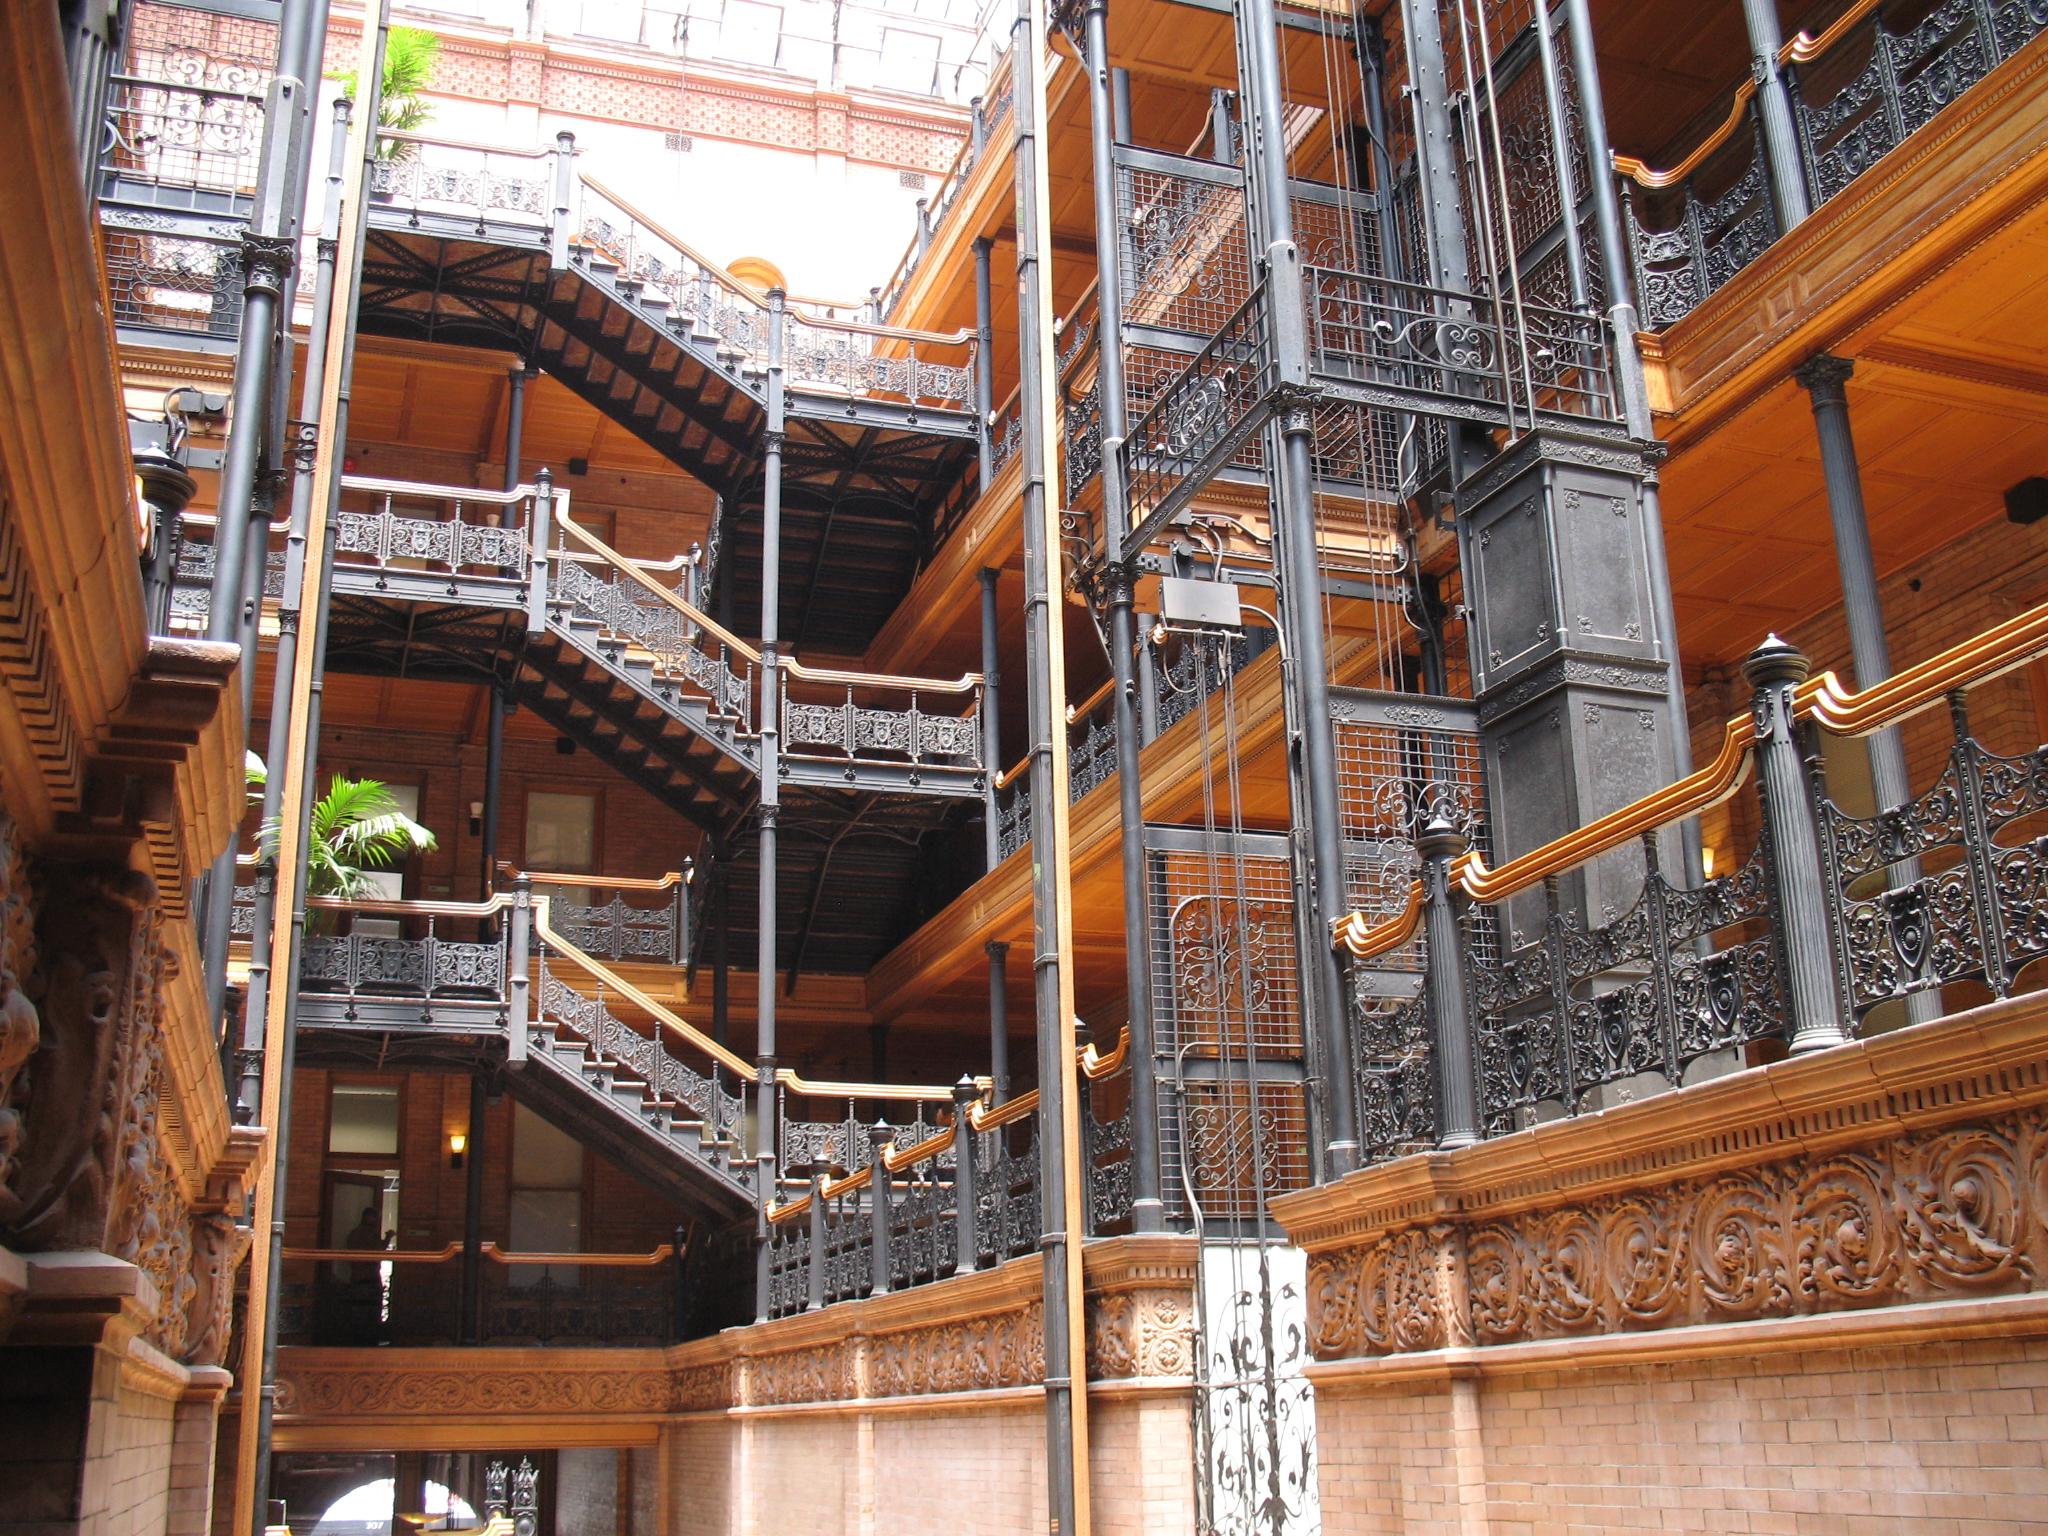 FileBradbury Building Interior Ironworkjpg Wikimedia